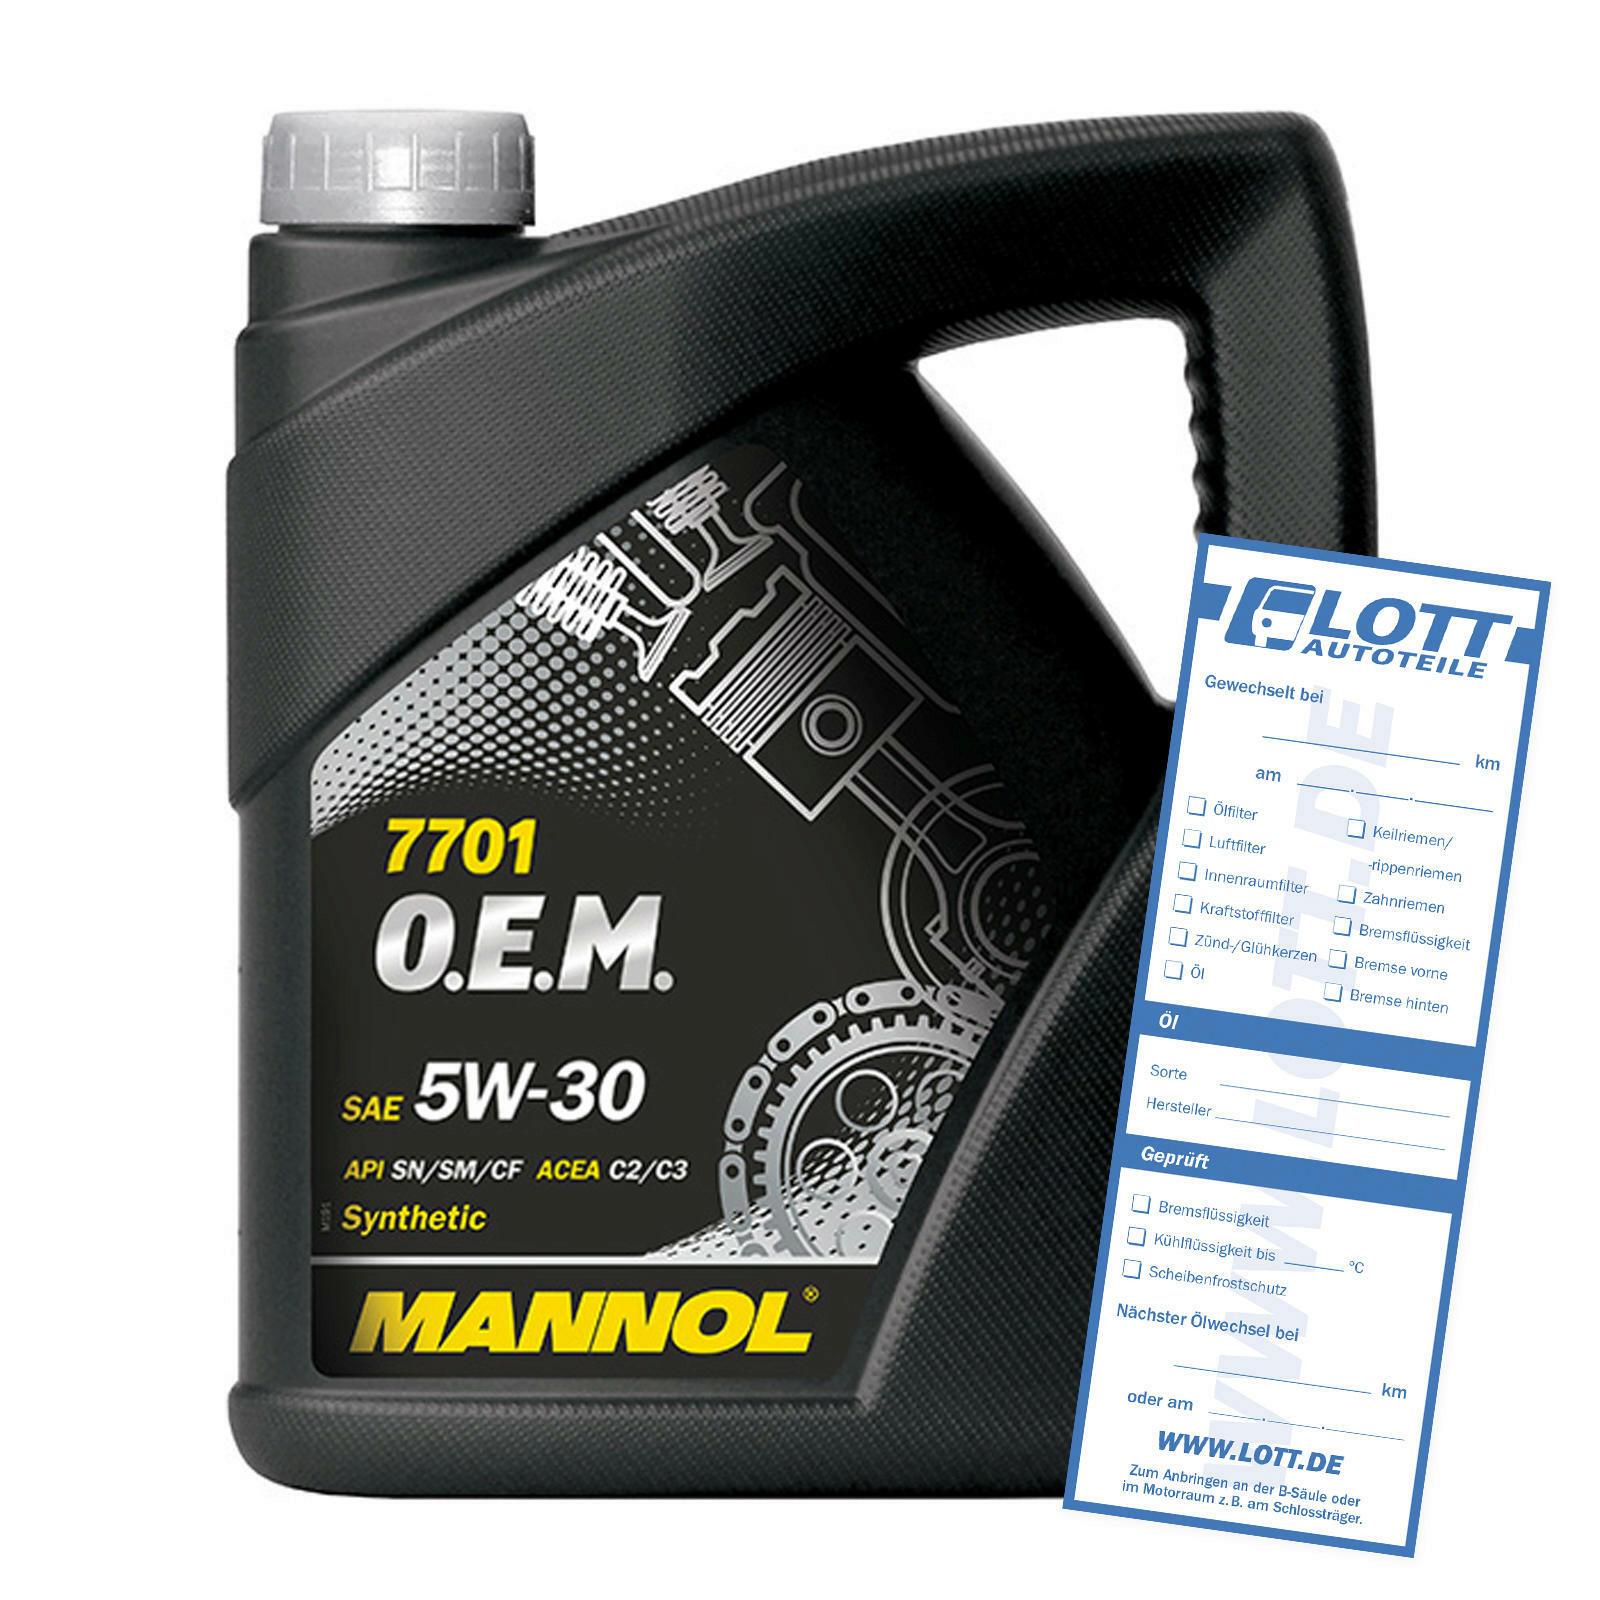 MANNOL 7701 O.E.M. 5W-30 4 Liter dexos2